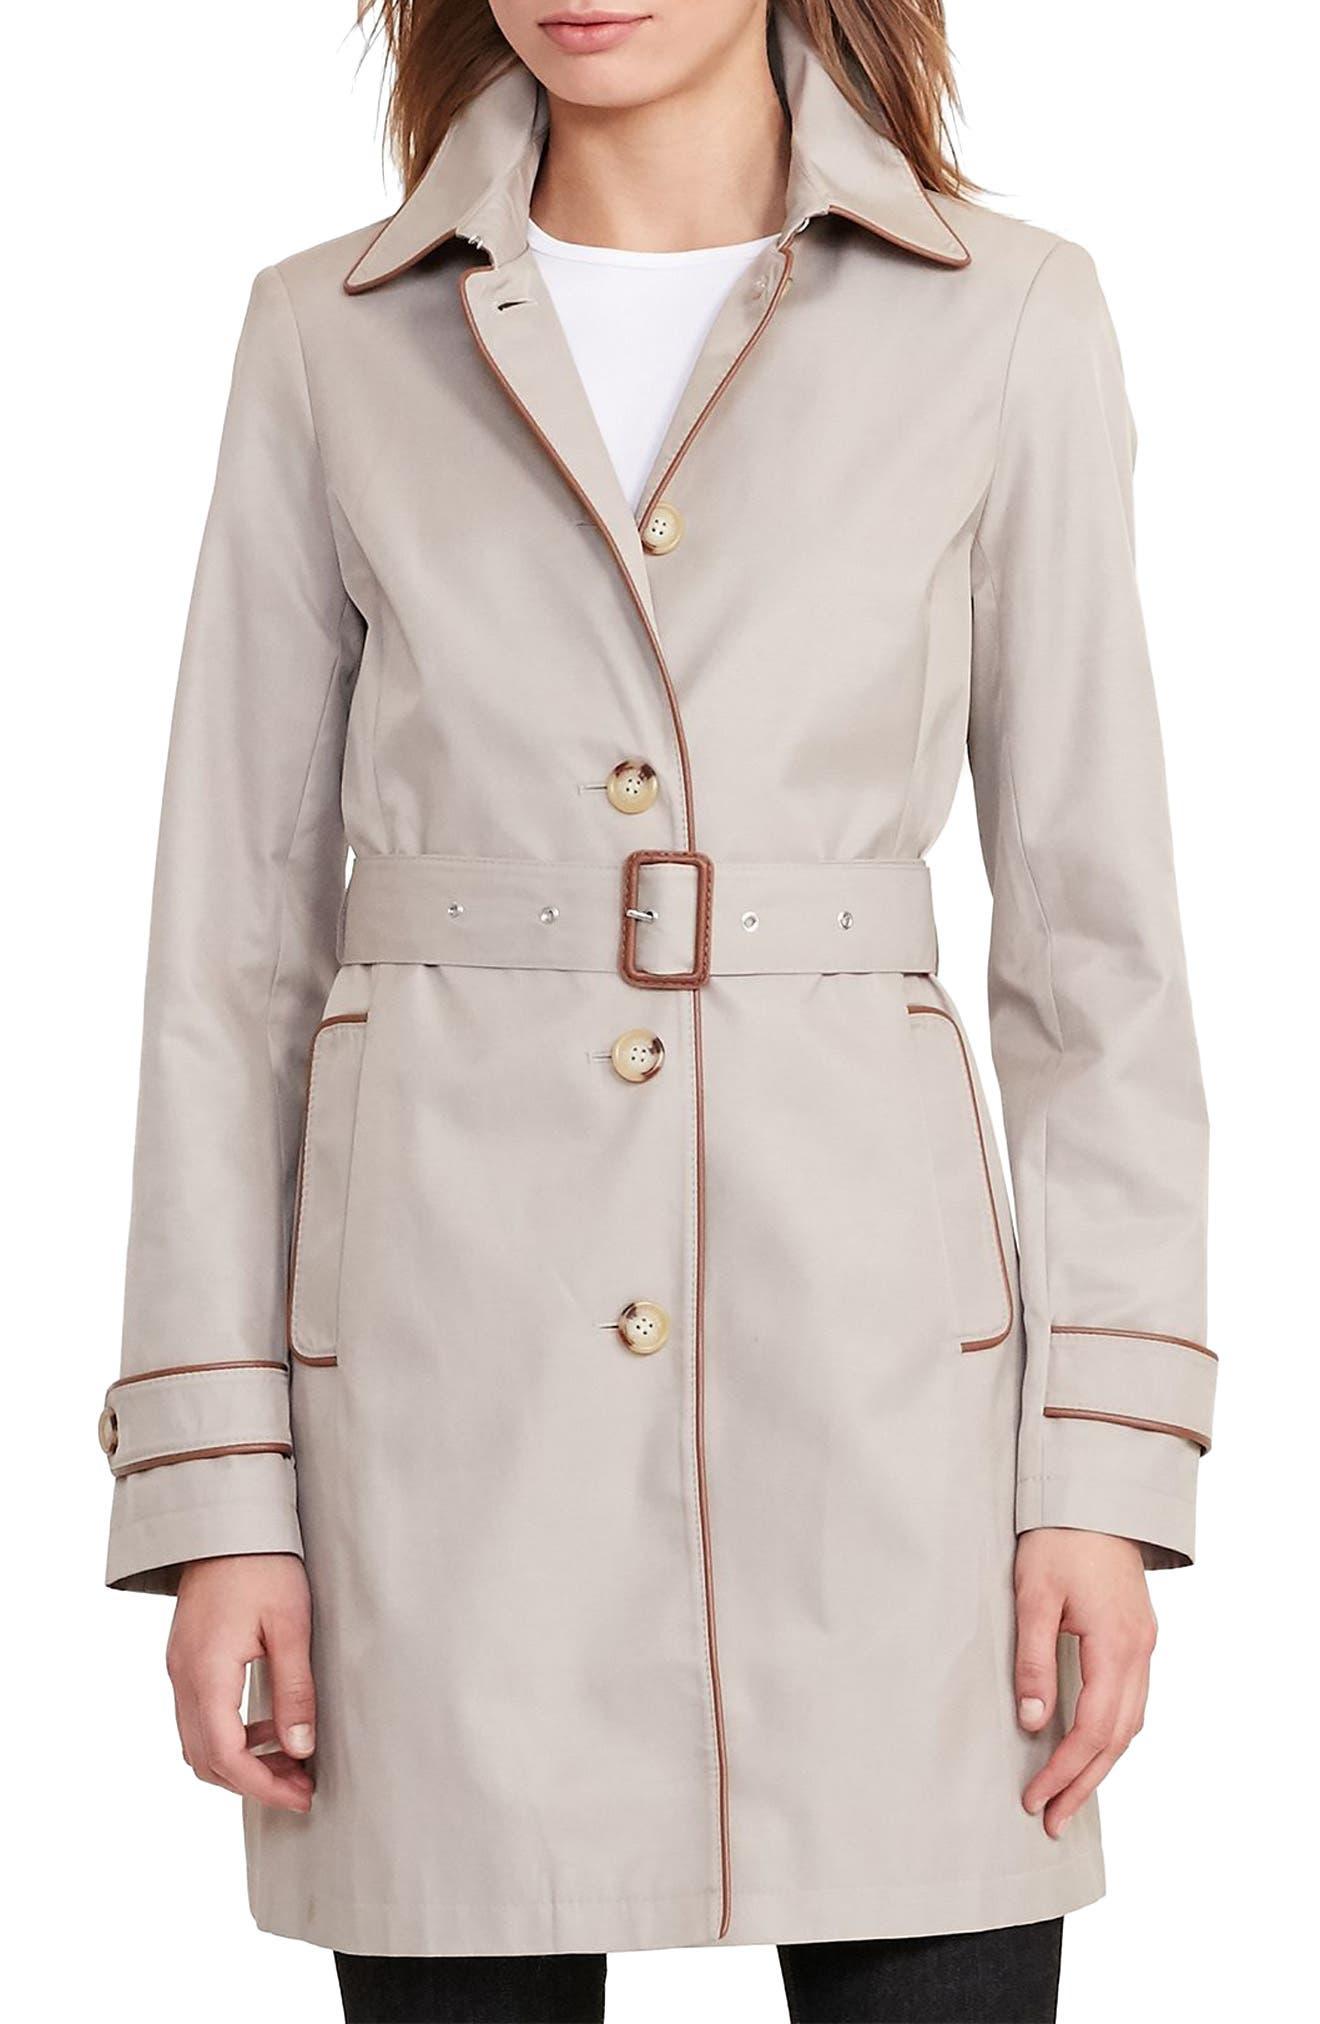 Alternate Image 1 Selected - Lauren Ralph Lauren Faux Leather Trim Trench Coat